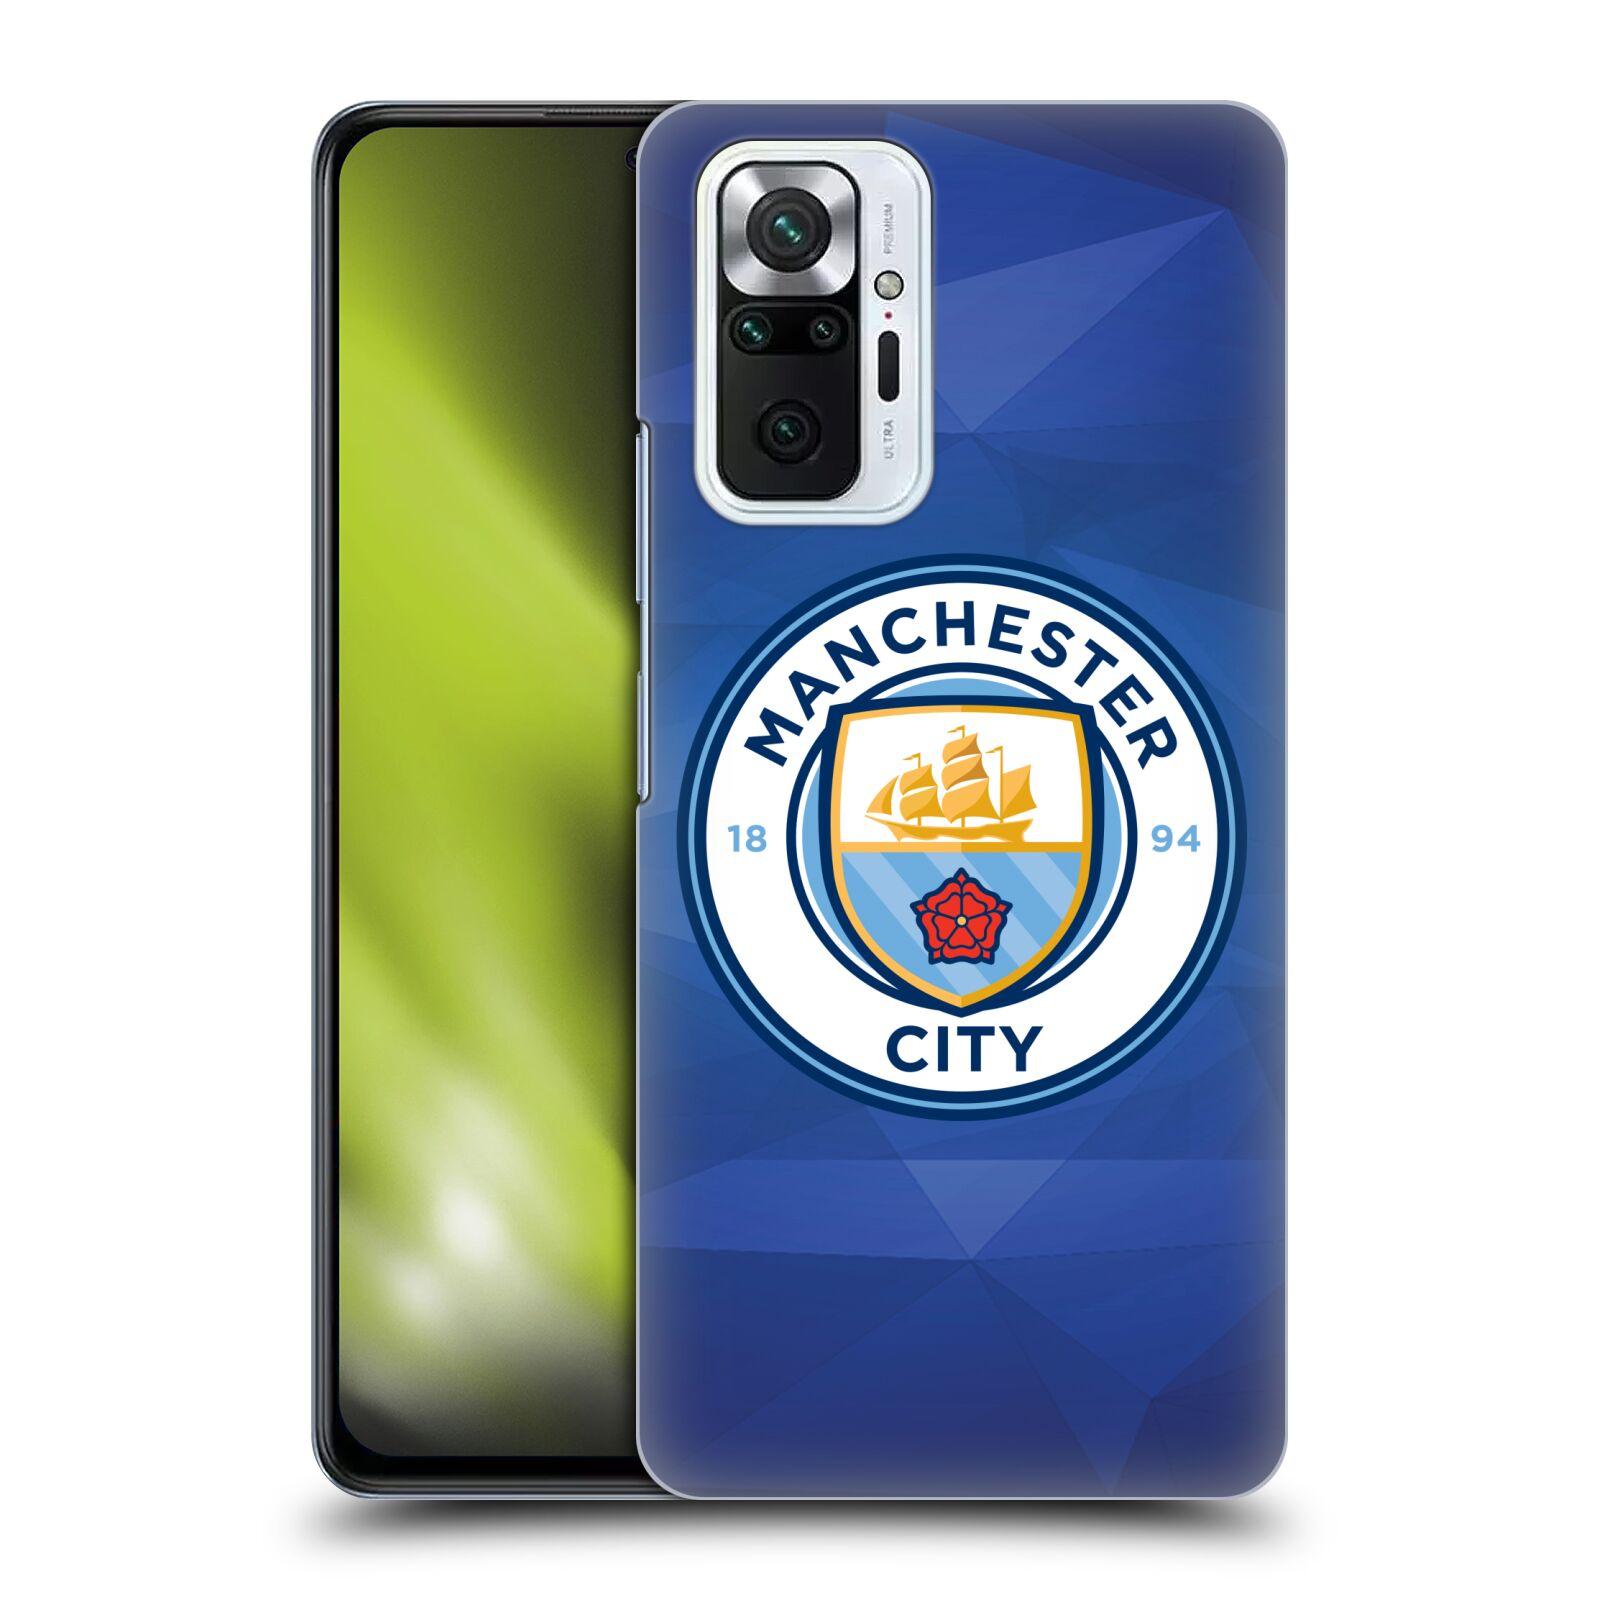 Plastové pouzdro na mobil Xiaomi Redmi Note 10 Pro - Head Case - Manchester City FC - Modré nové logo